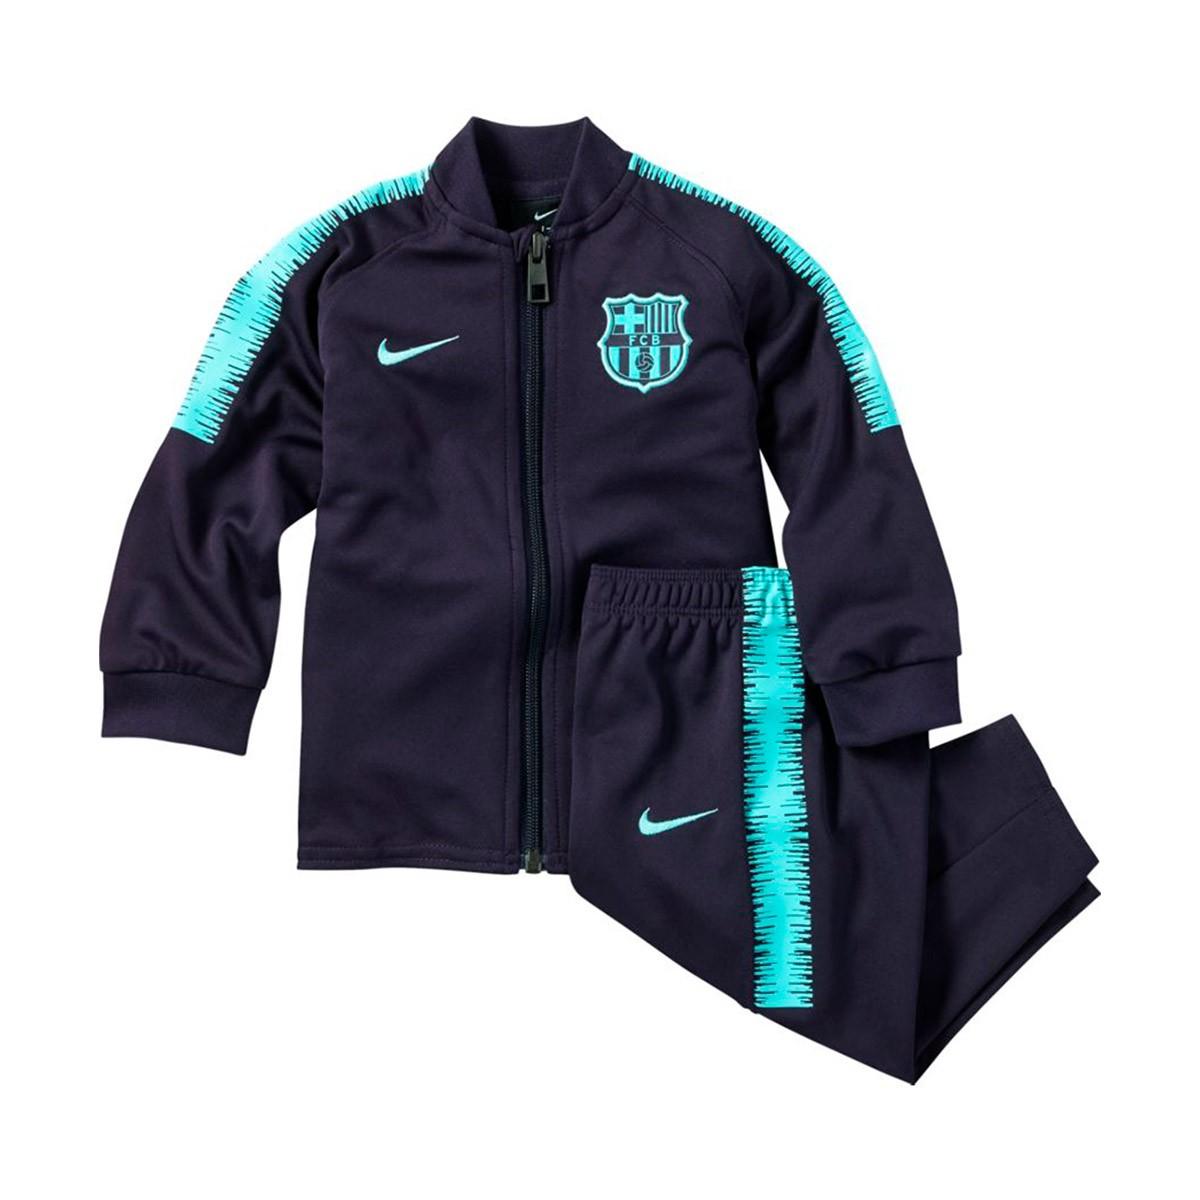 ea21a8951 Chándal Nike Bebé Dry FC Barcelona Squad 2018-2019 Purple dynasty-Hyper  turquoise - Tienda de fútbol Fútbol Emotion